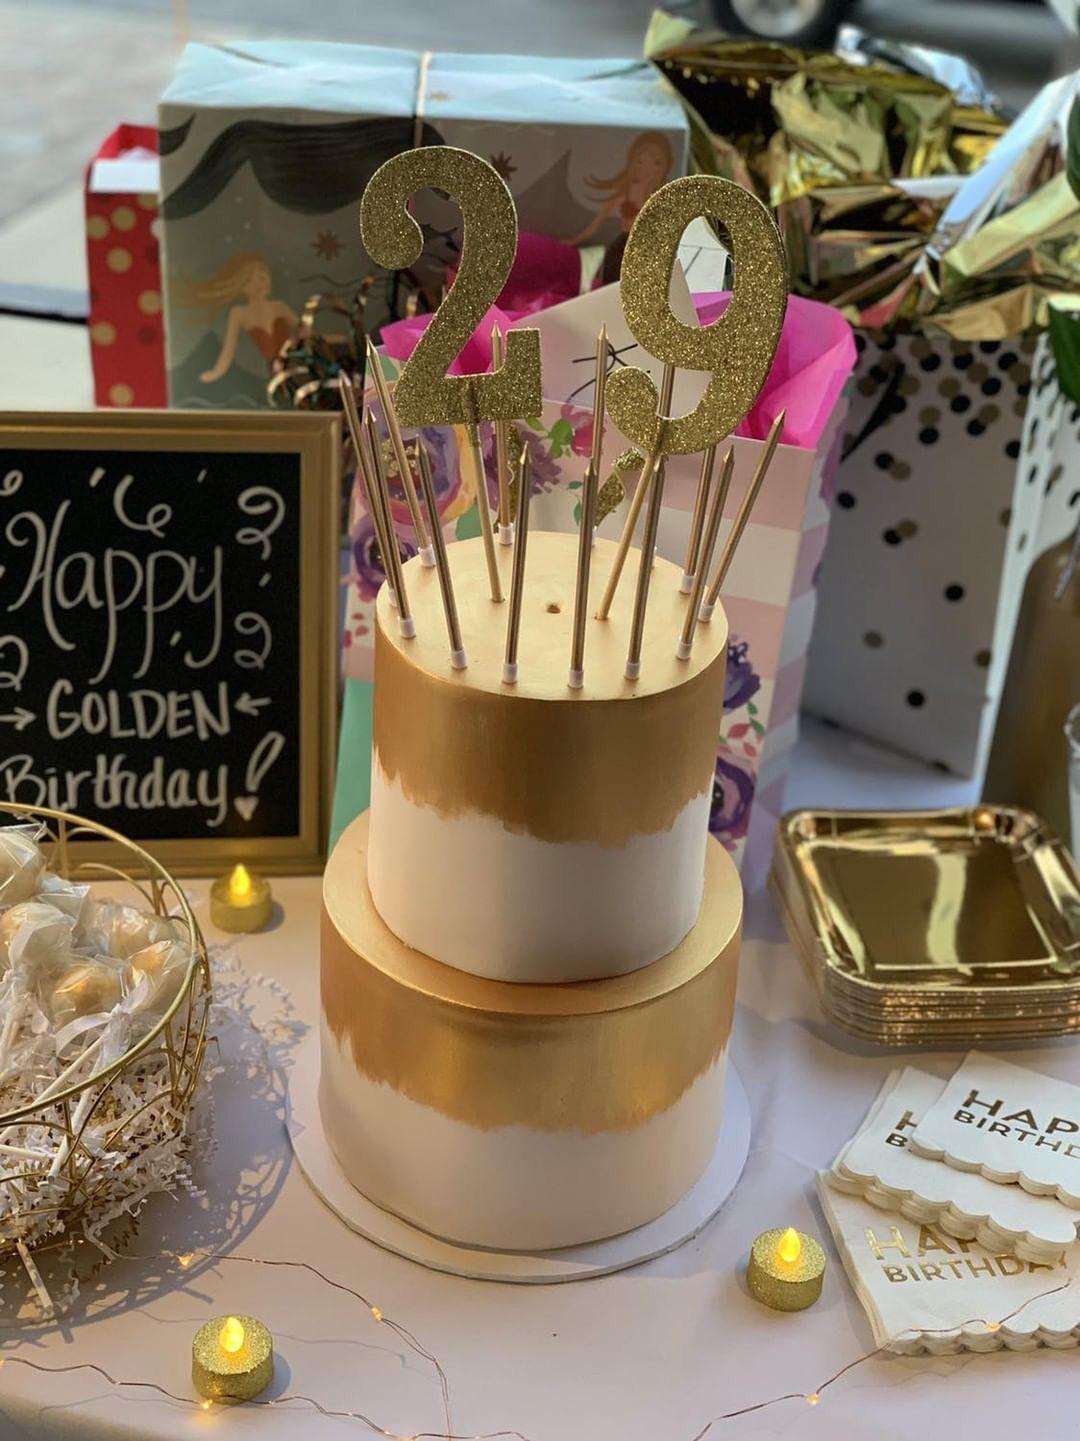 Golden Birthday Cake Golden birthday cakes, Golden